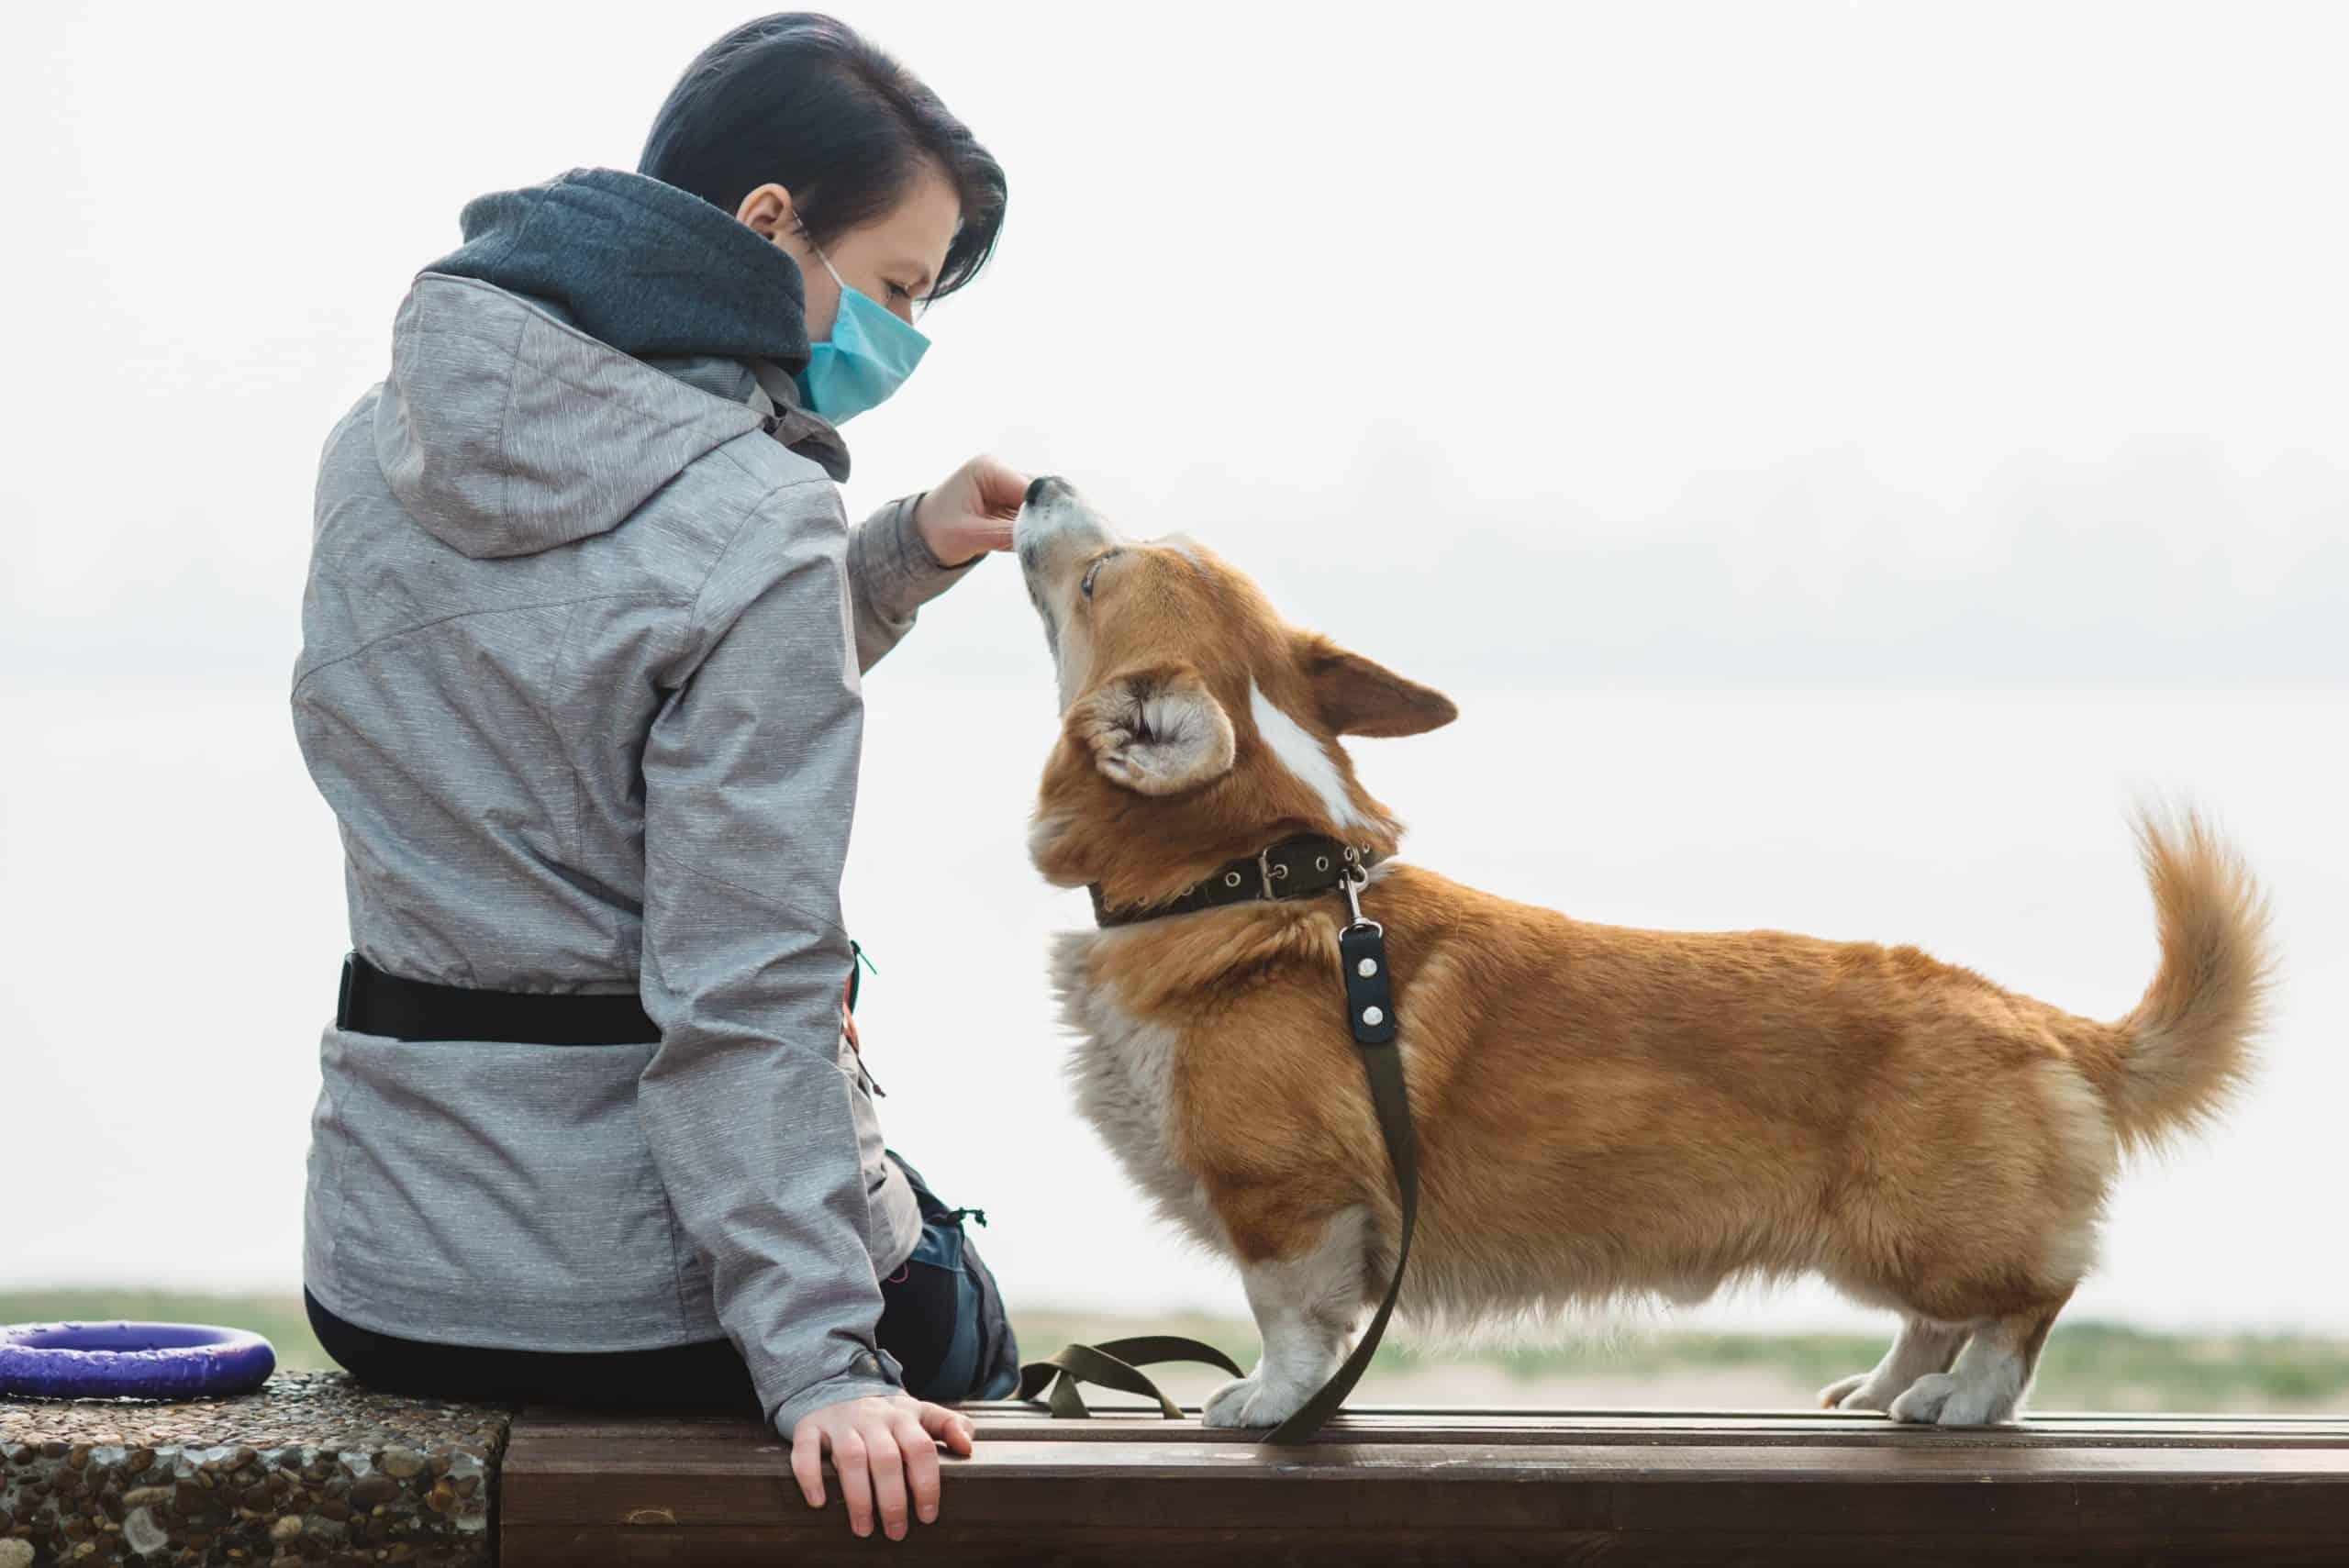 woman in mask feeding her dog a treat